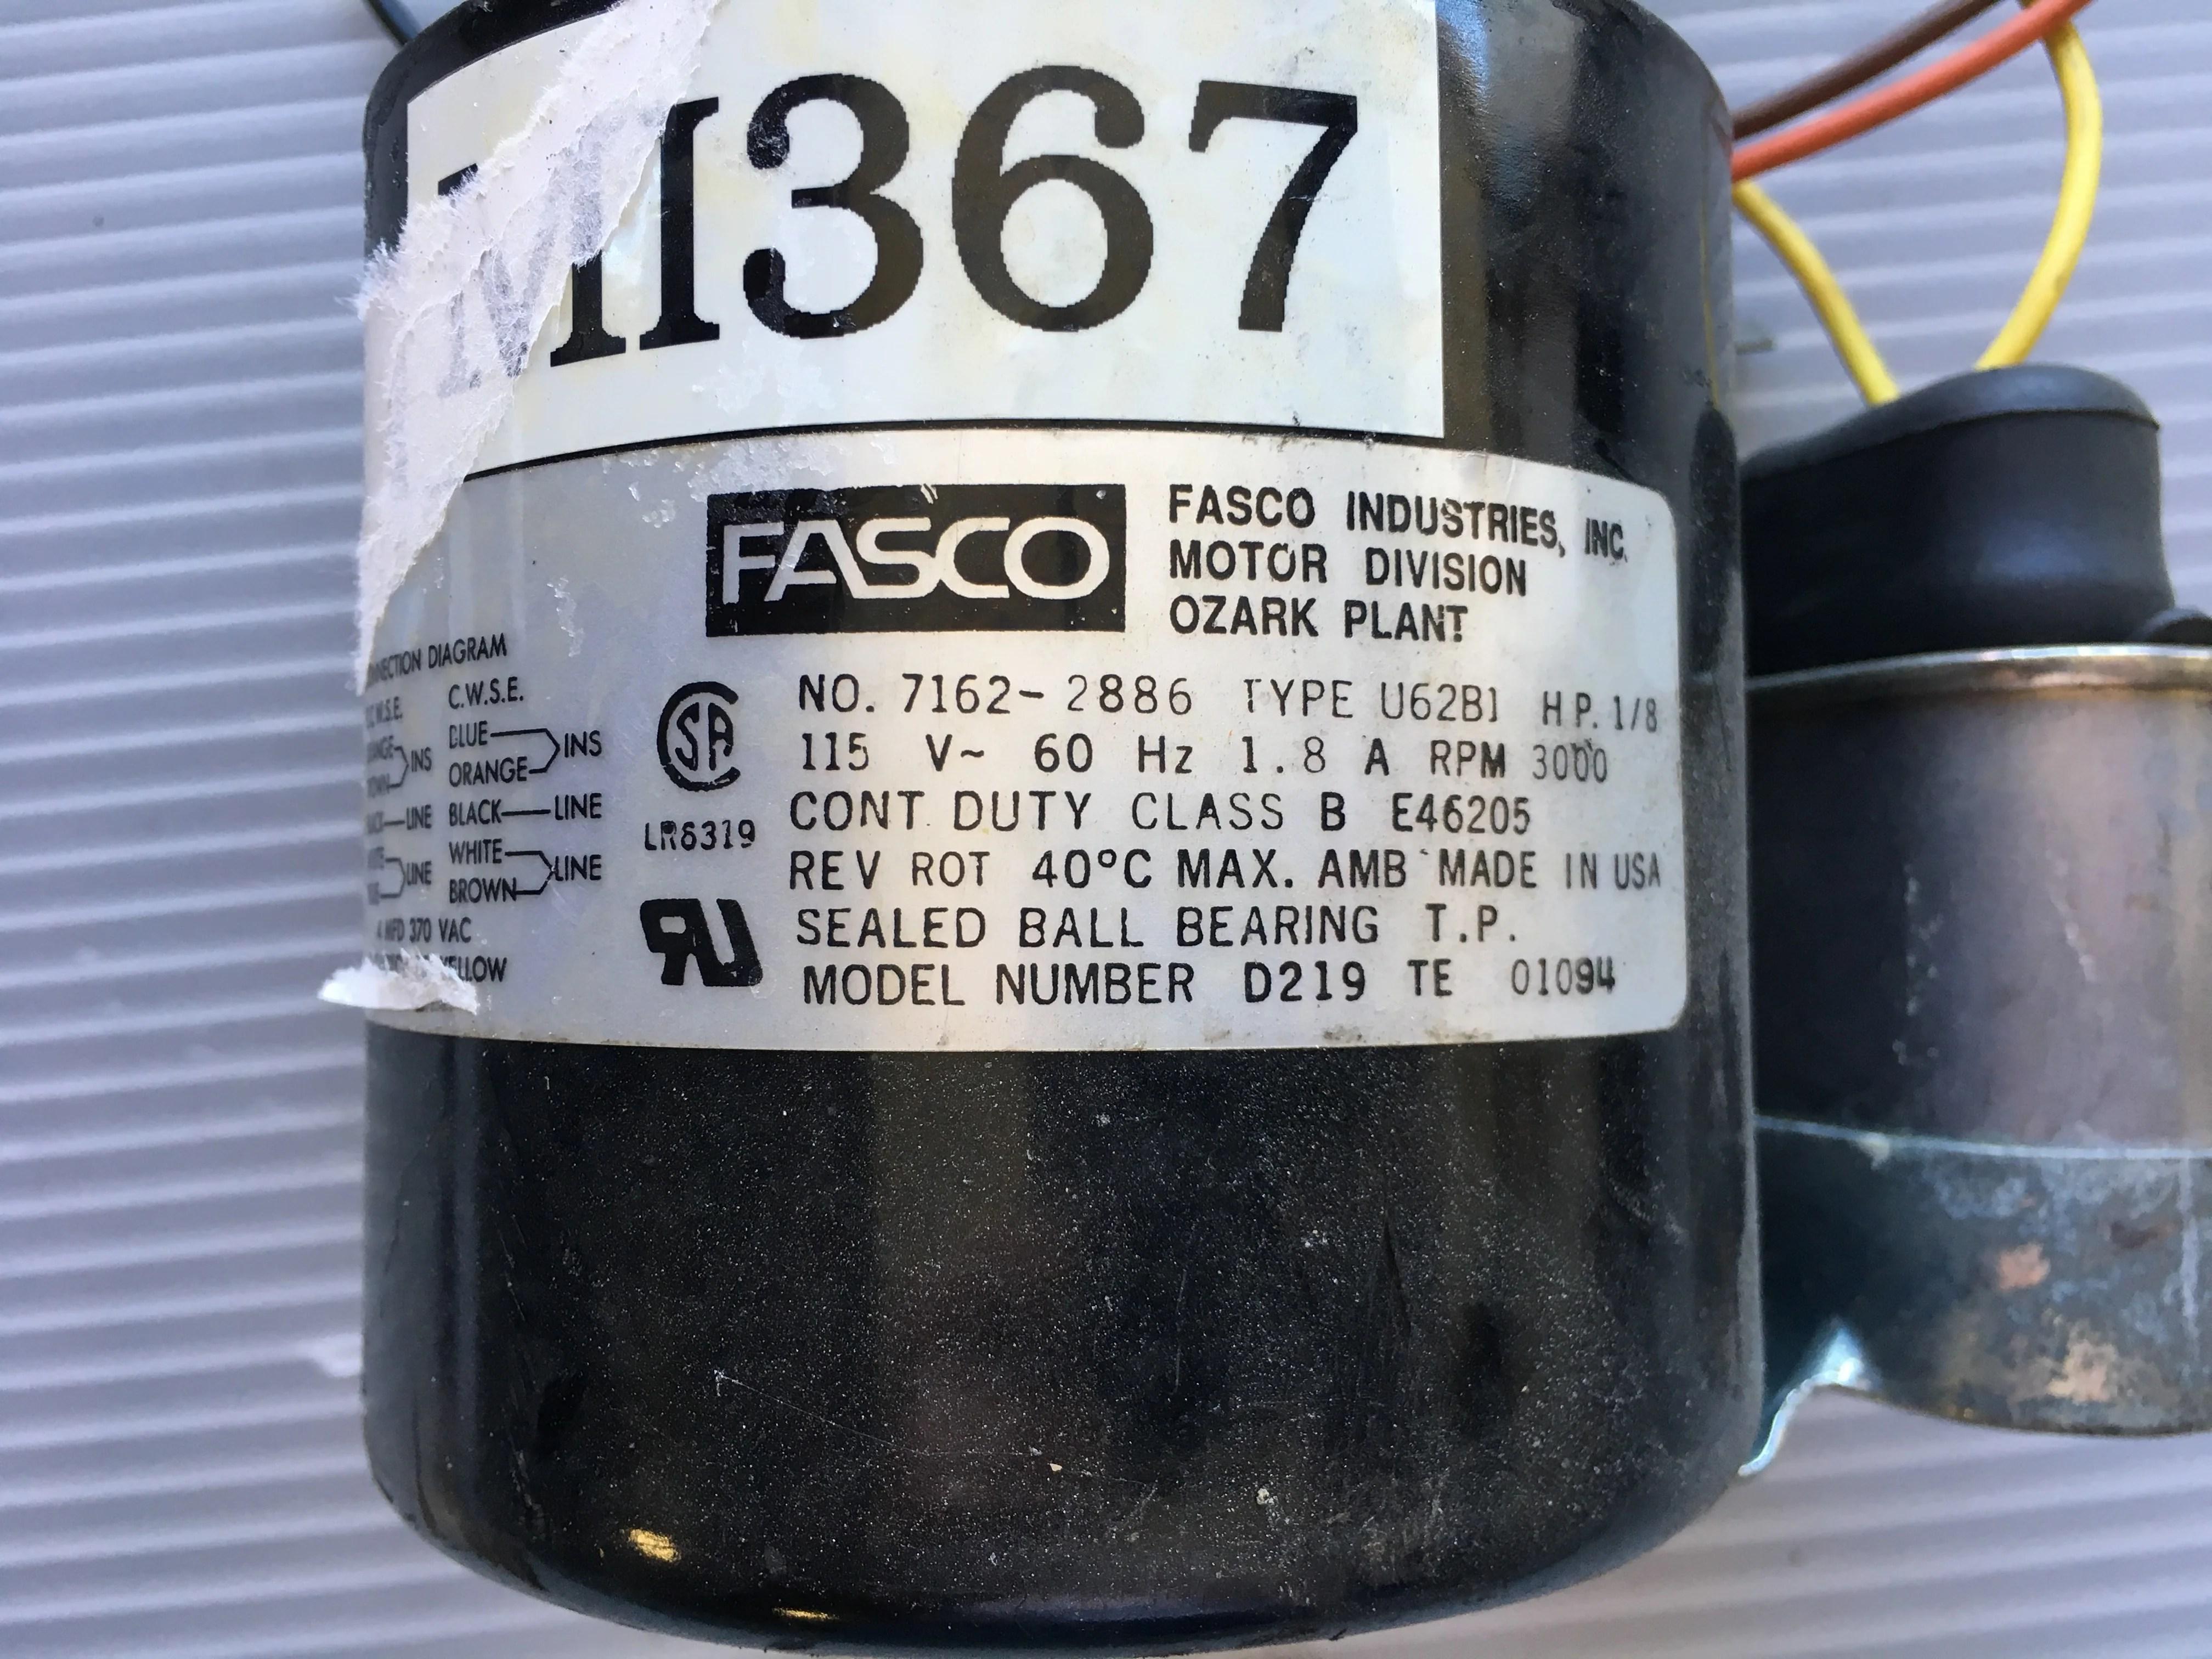 fasco motor u62b1 1 8 hp 3000 rpm 115 v metal logics inc empire wiring diagrams fasco type u62b1 wiring diagram [ 4032 x 3024 Pixel ]